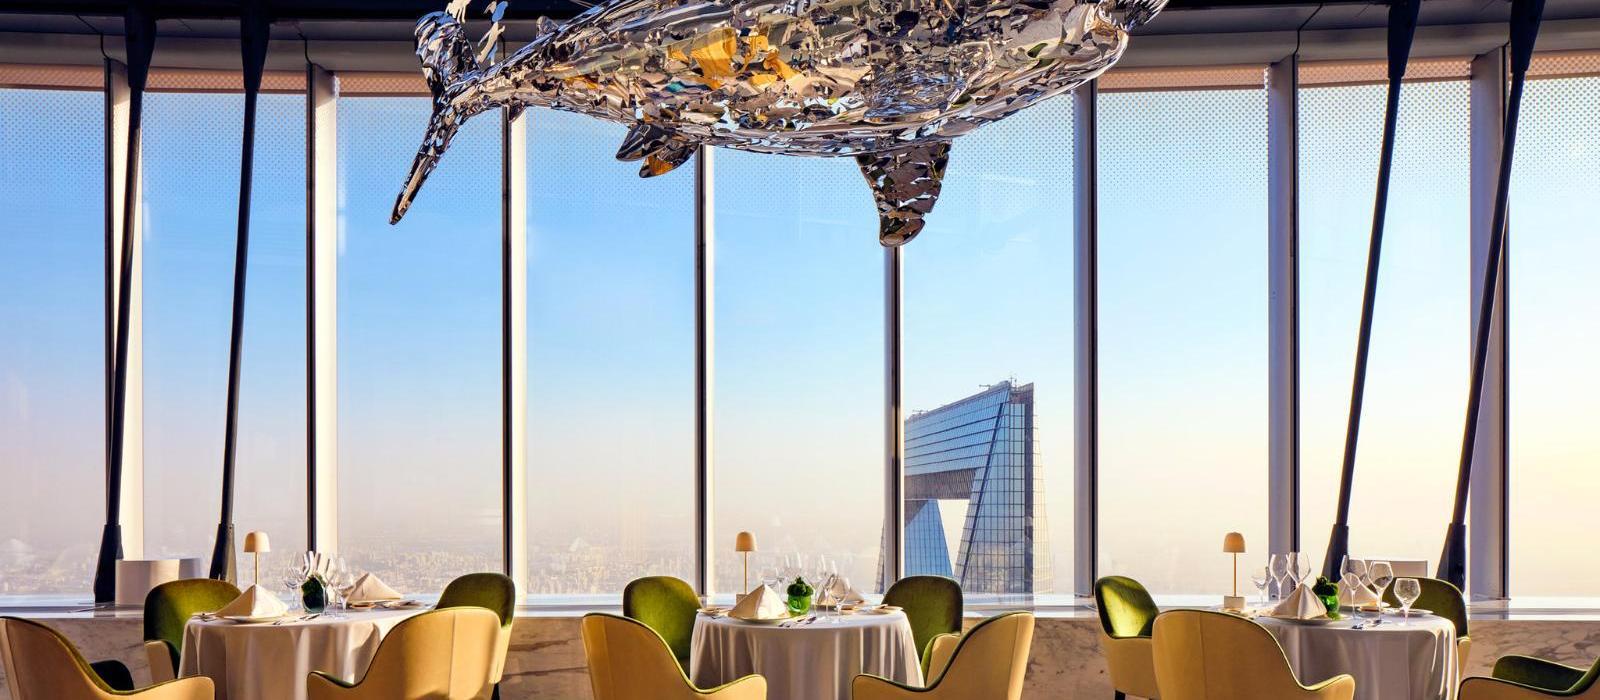 J 酒店上海中心(J Hotel Shanghai Tower) 图片  www.lhw.cn